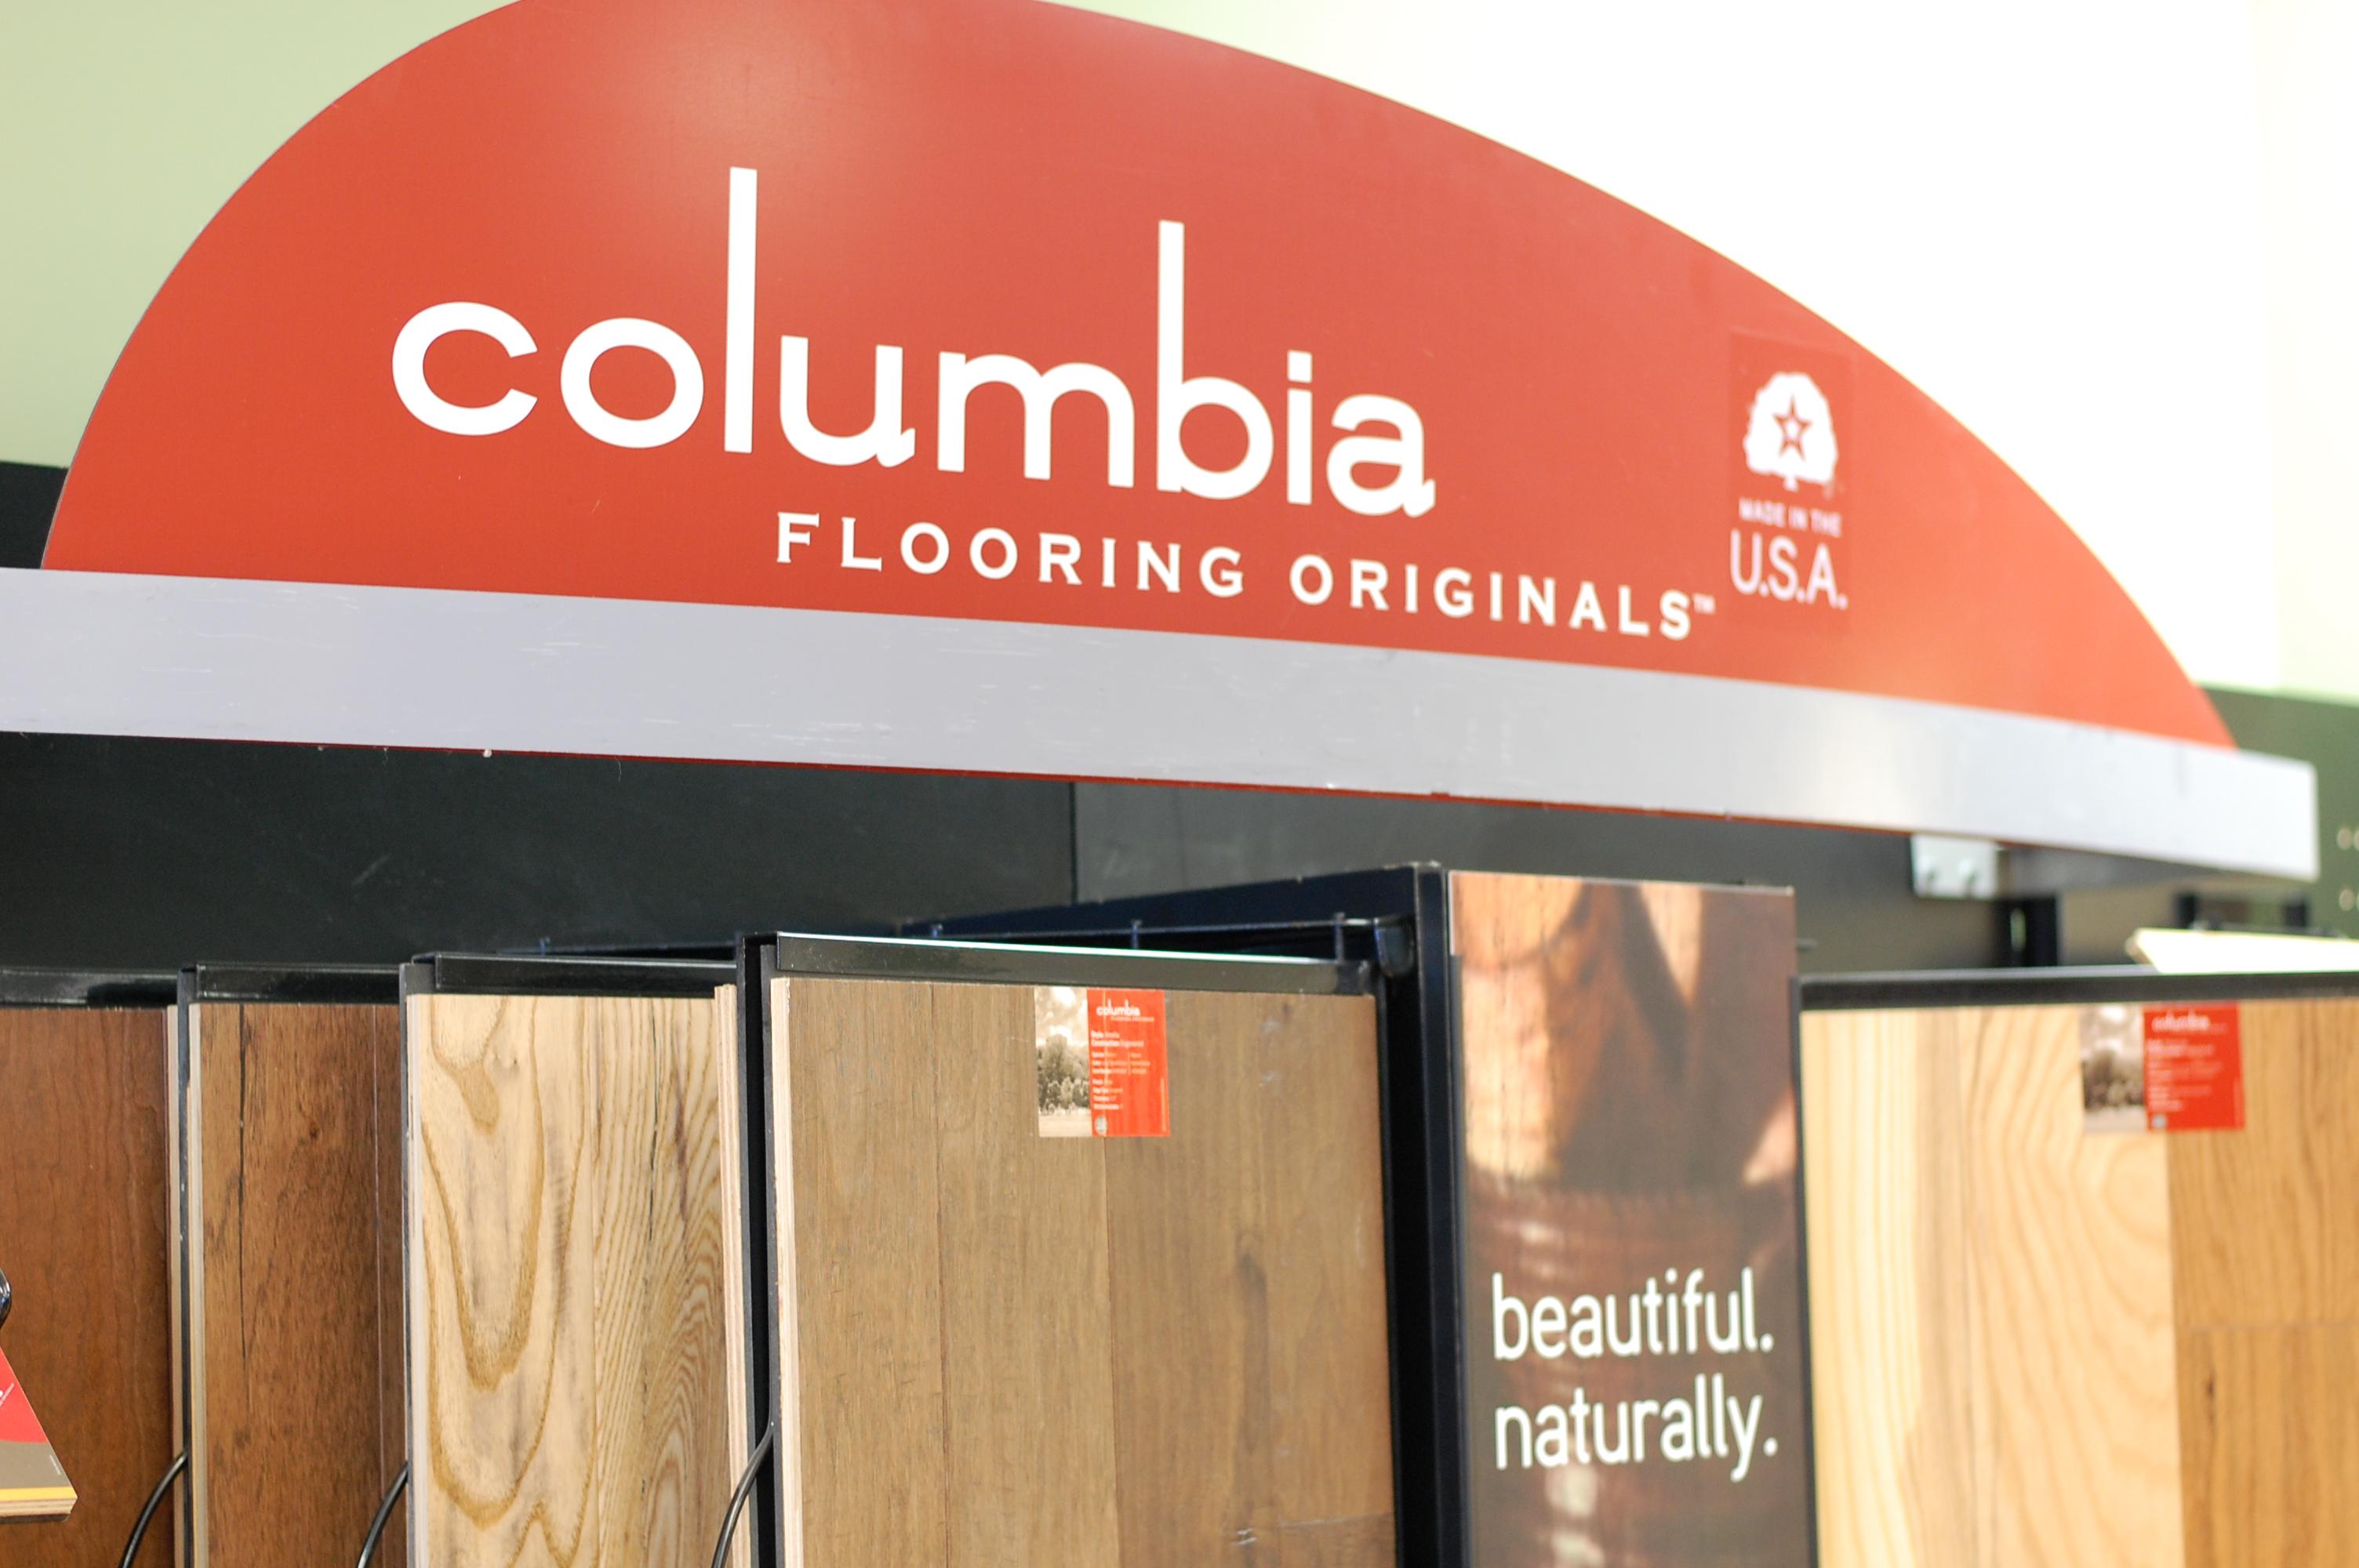 Hardwood flooring charleston sc carolina flooring services for Columbia flooring